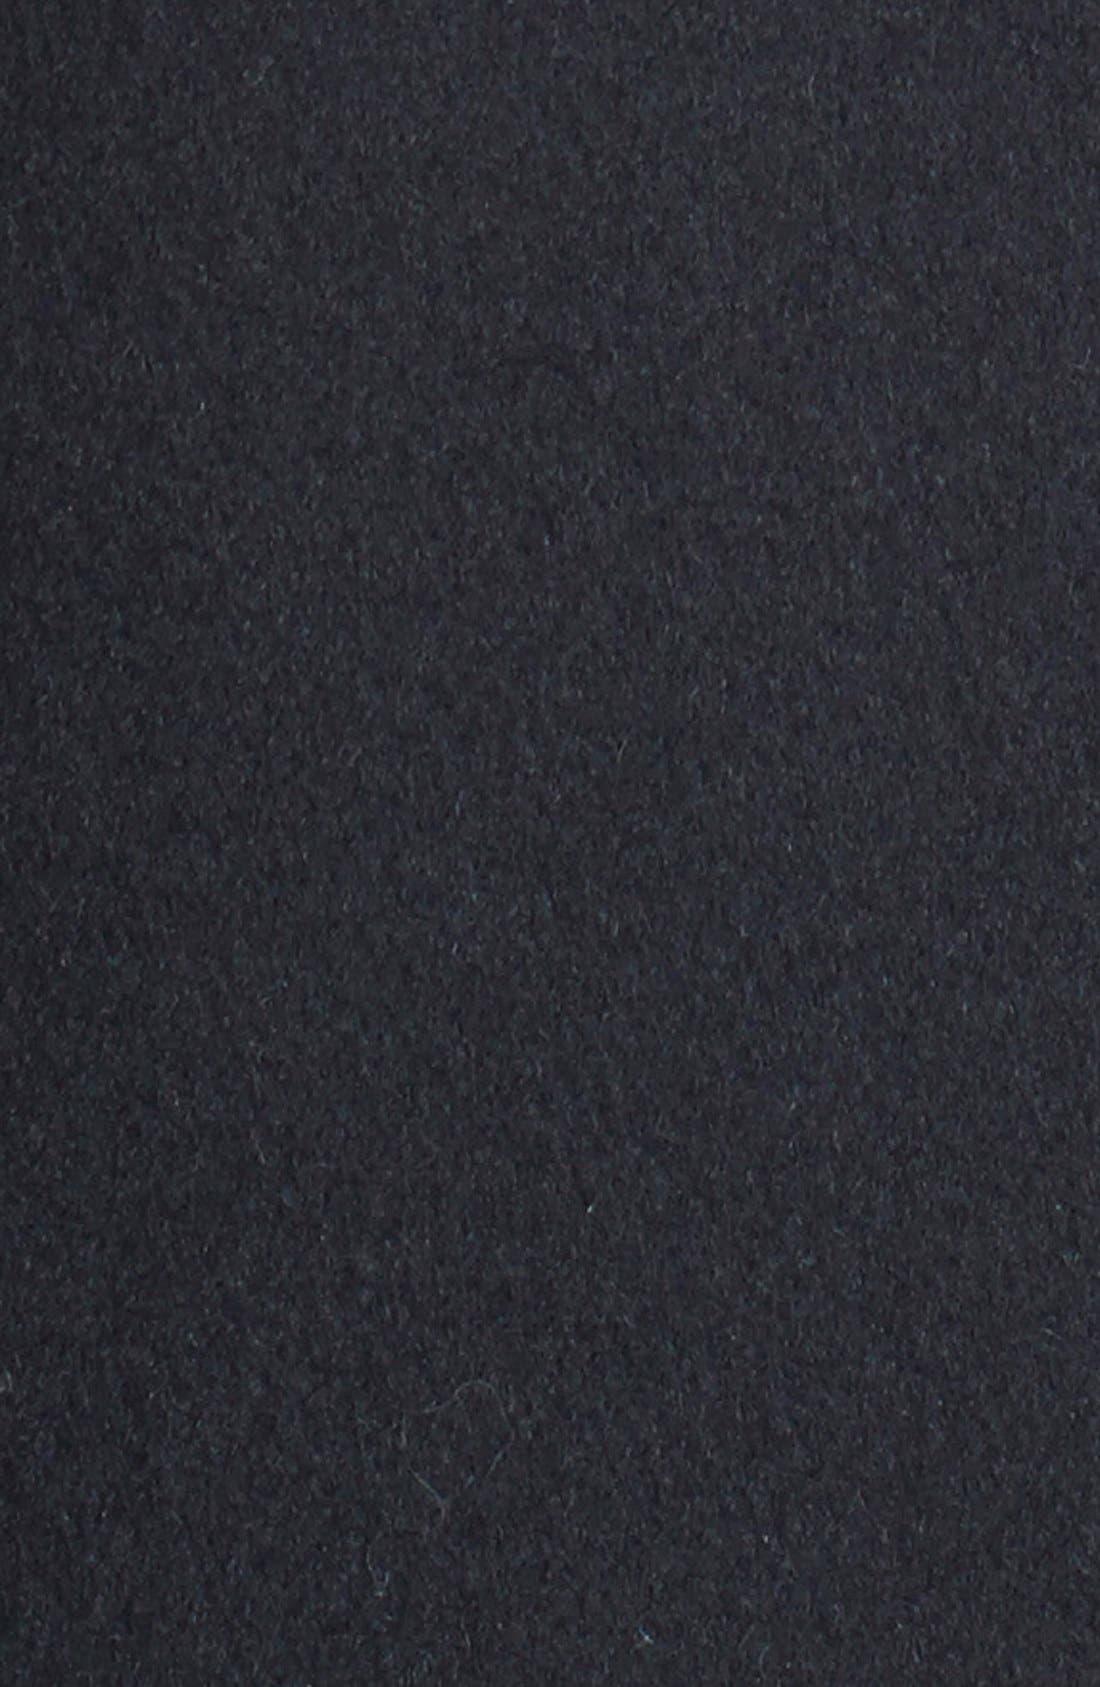 Alternate Image 3  - Vince Camuto Water Repellent Wool Blend Car Coat